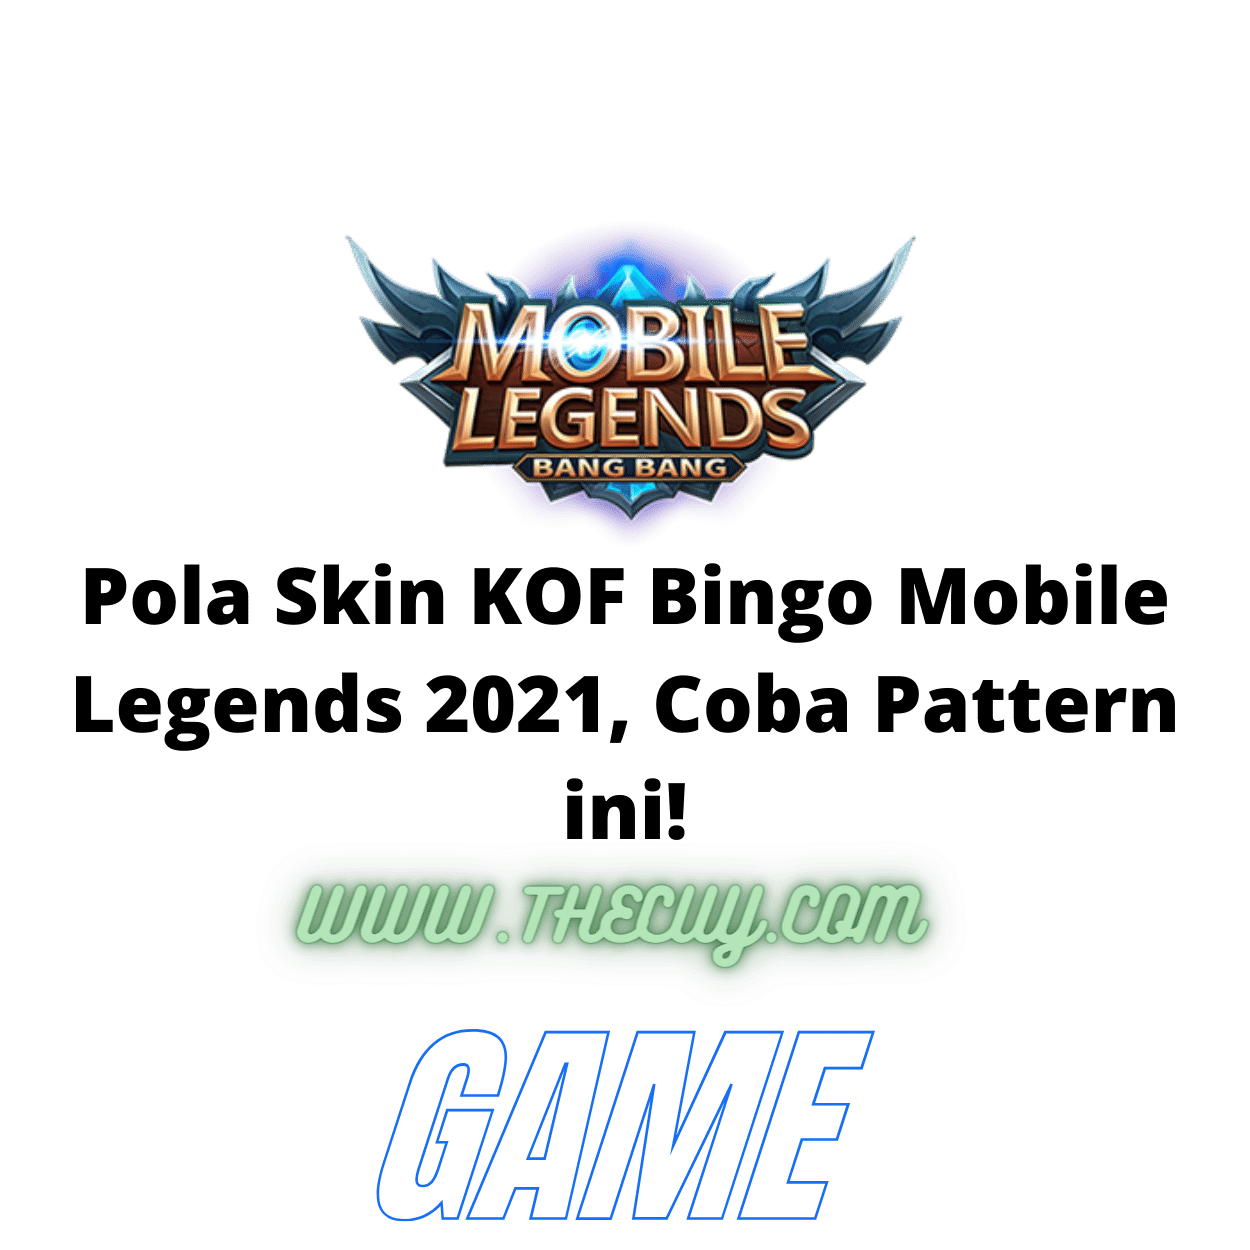 Pola Skin KOF Bingo Mobile Legends 2021, Coba Pattern ini!